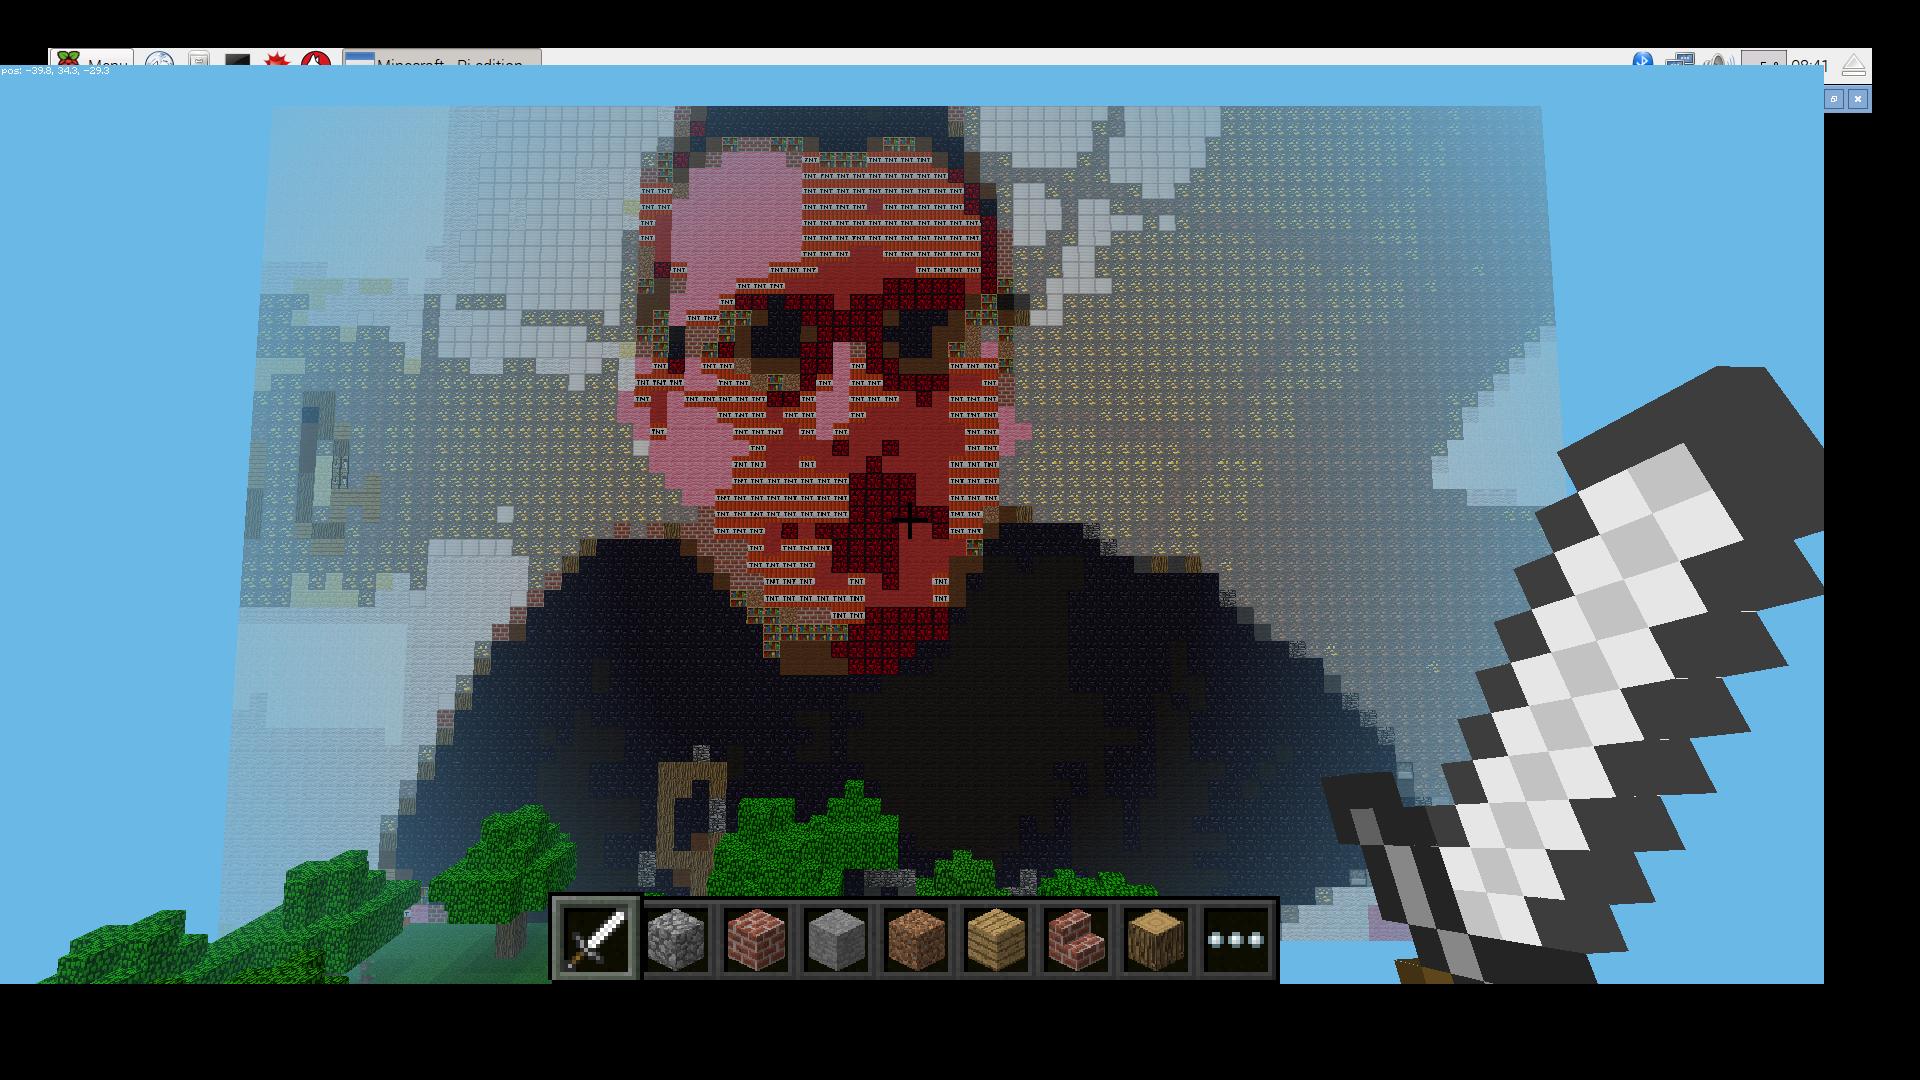 Minecraft Selfies - Starting the Minecraft API   Raspberry Pi Projects